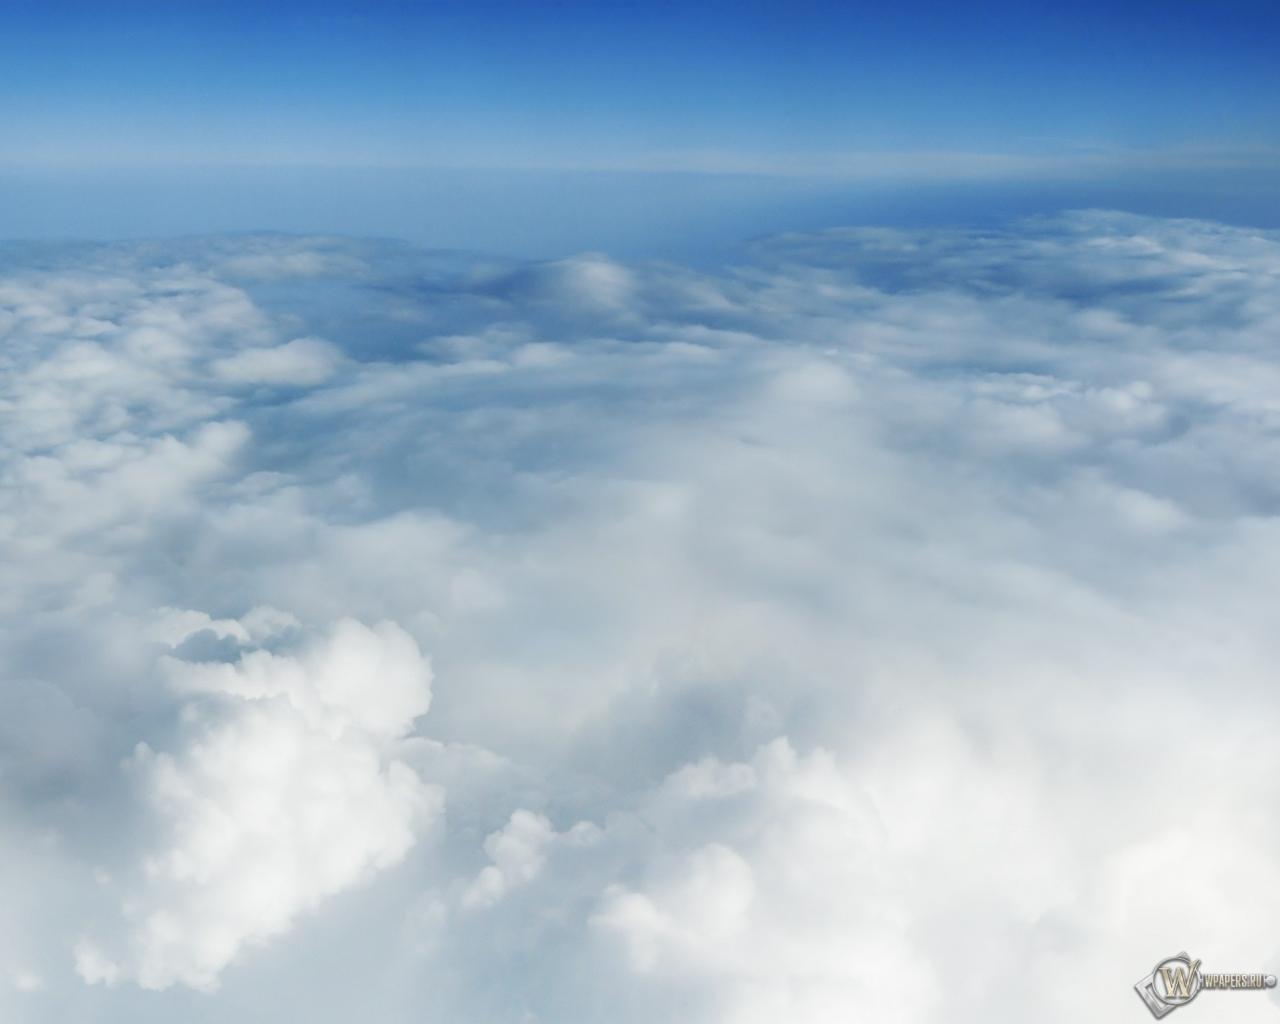 За облаками 1280x1024